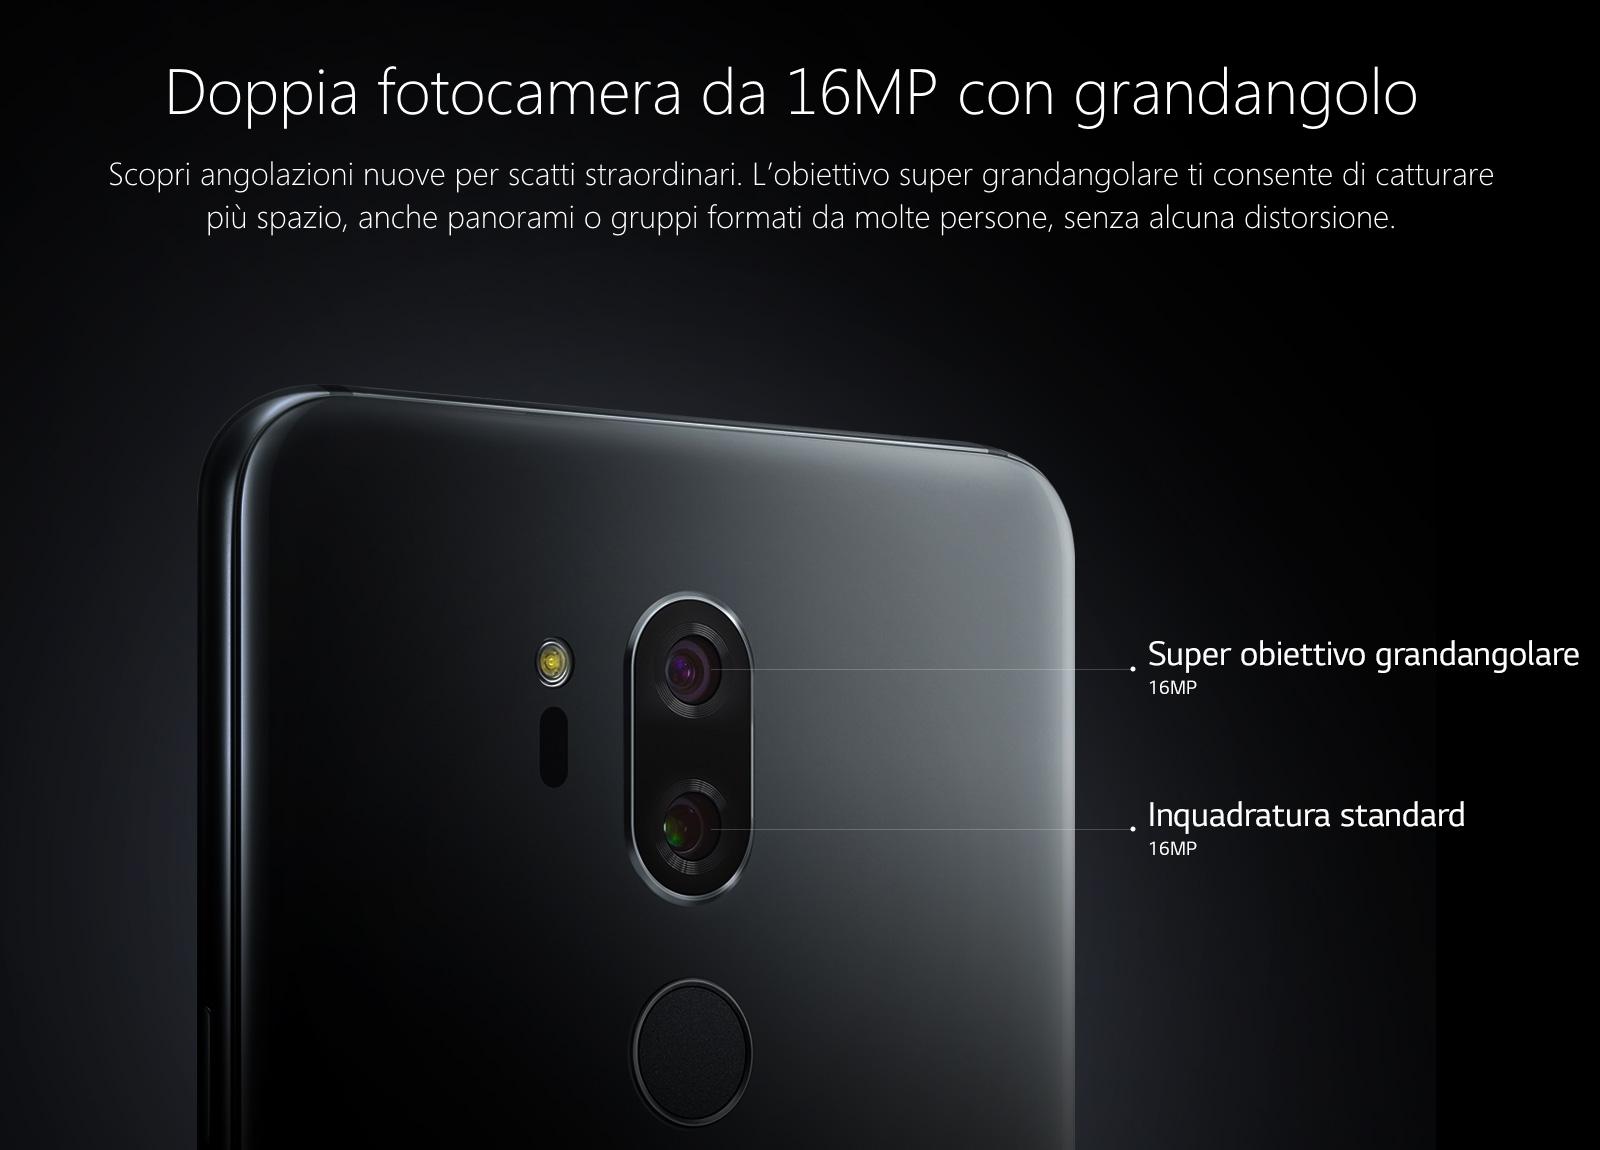 07_G7-ThinQ_Dual-16mp-cameras_desktop